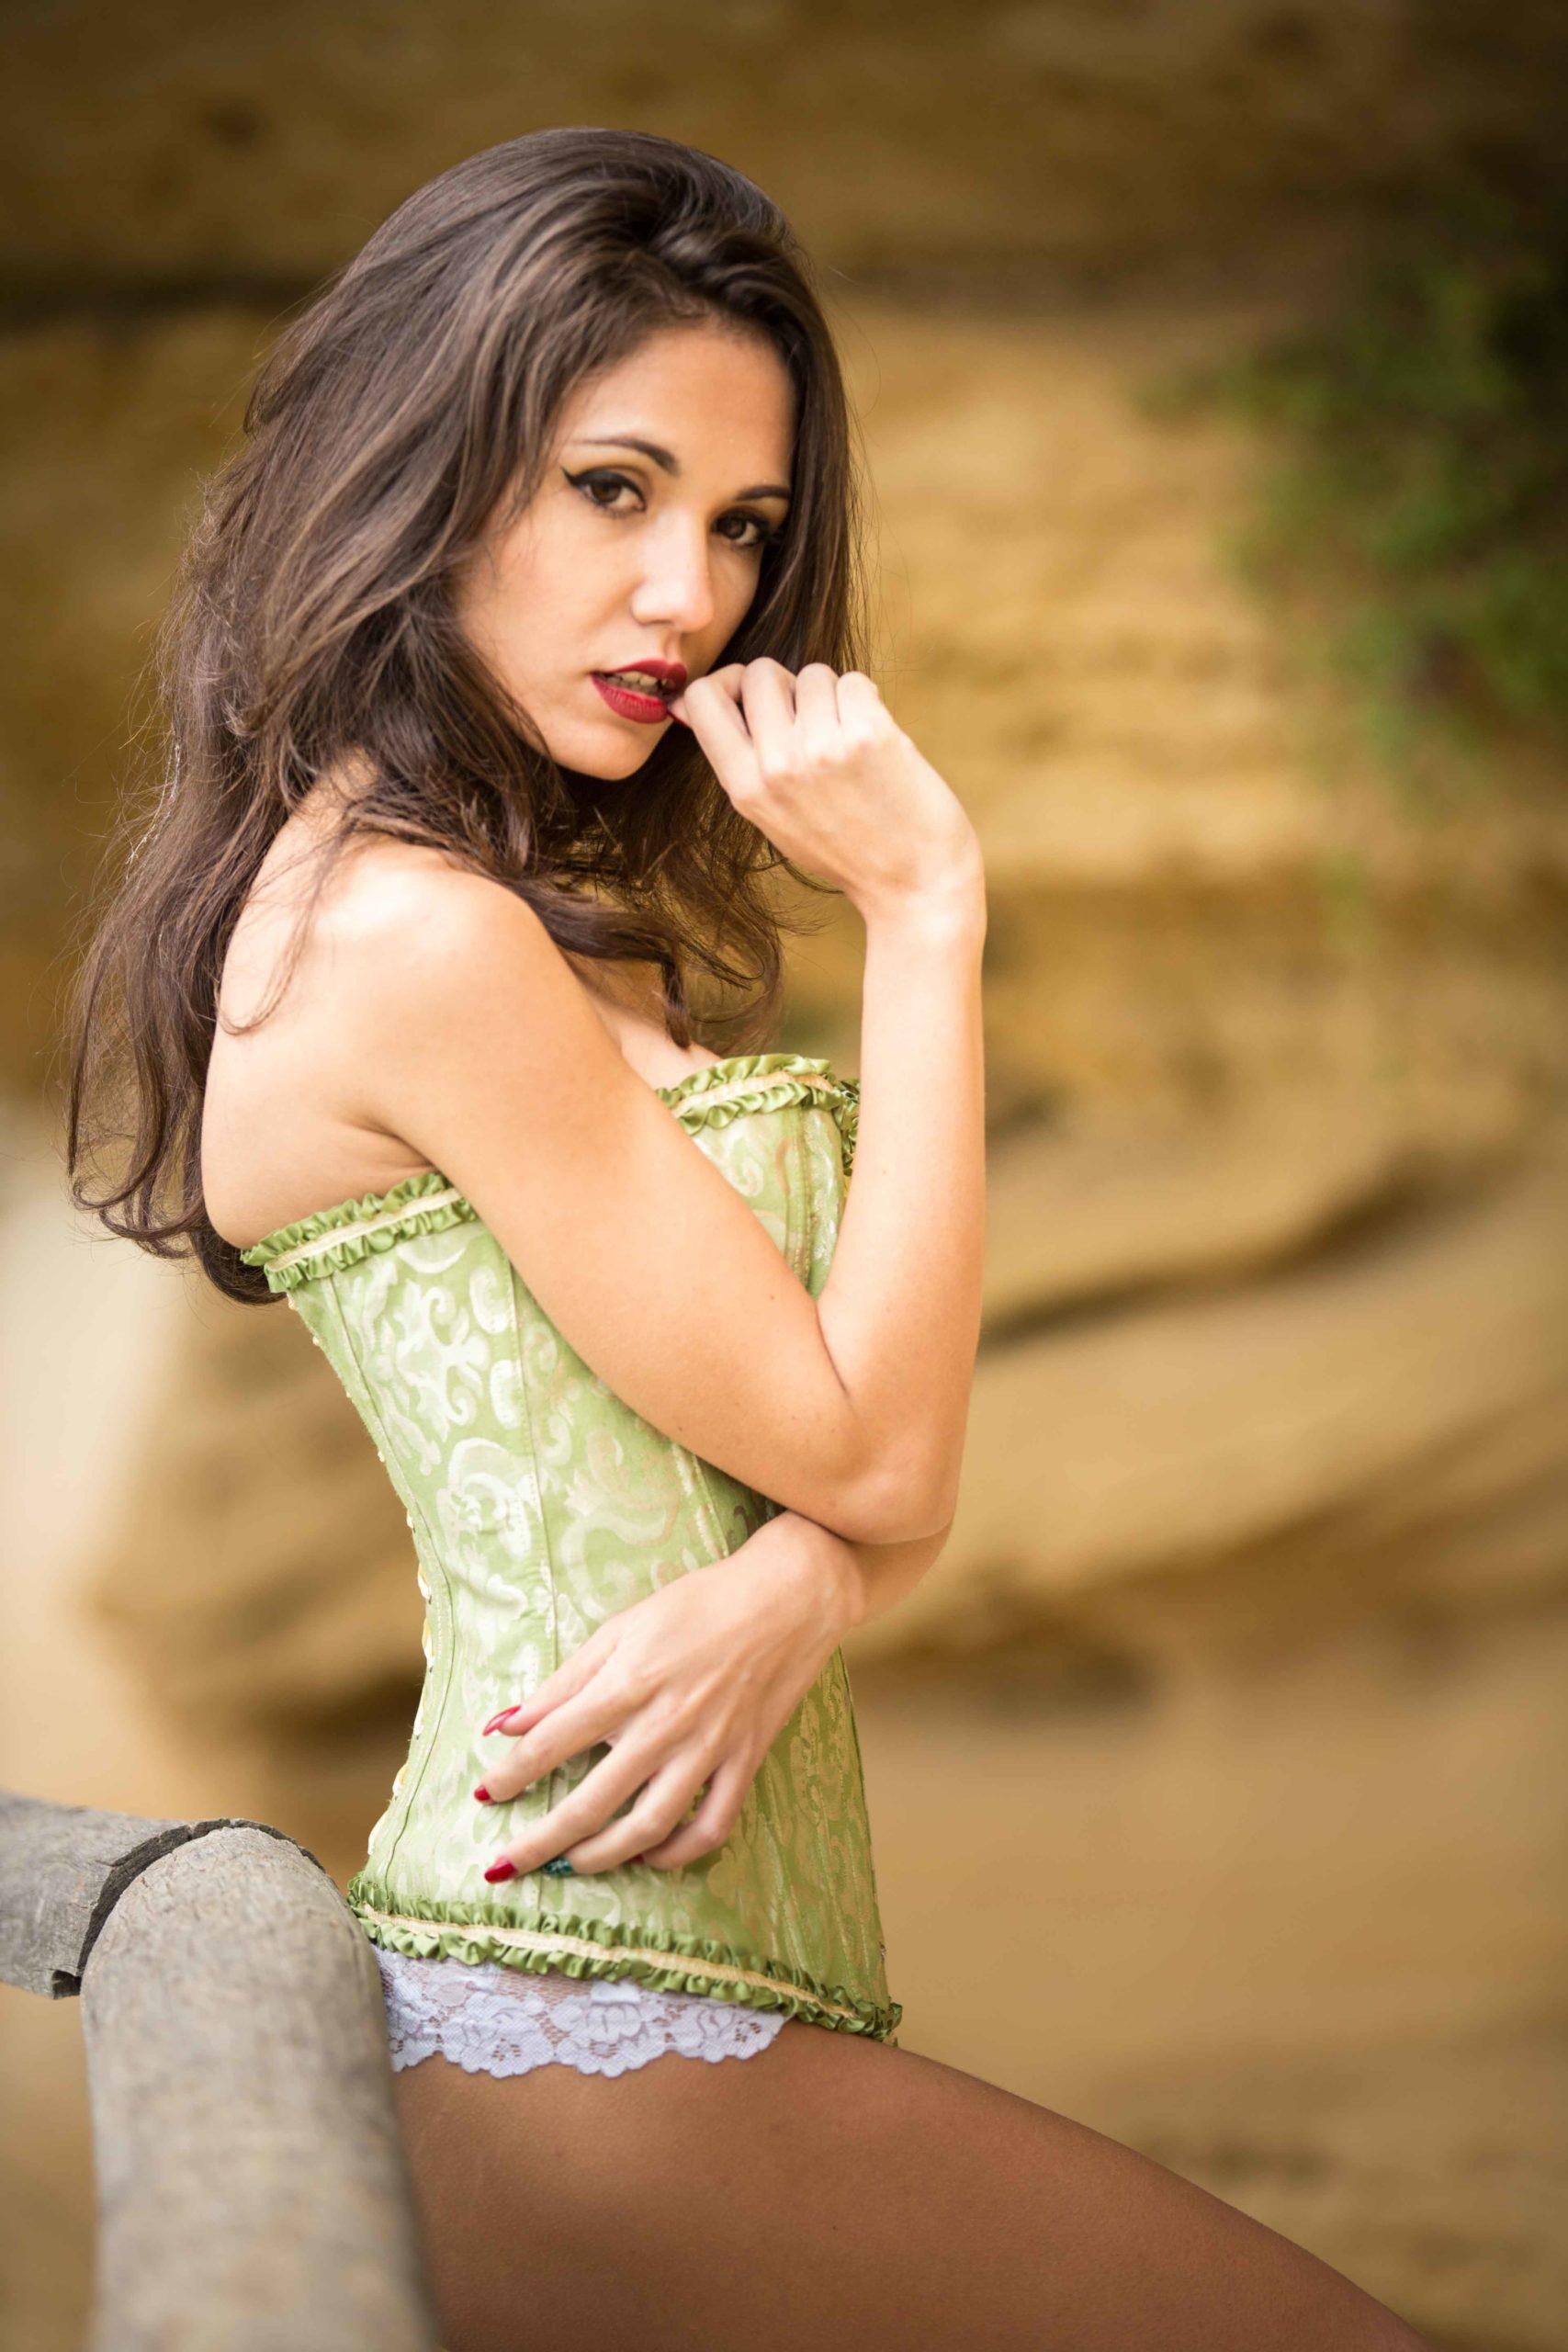 Francesca_Barbarossa_book_Messina23